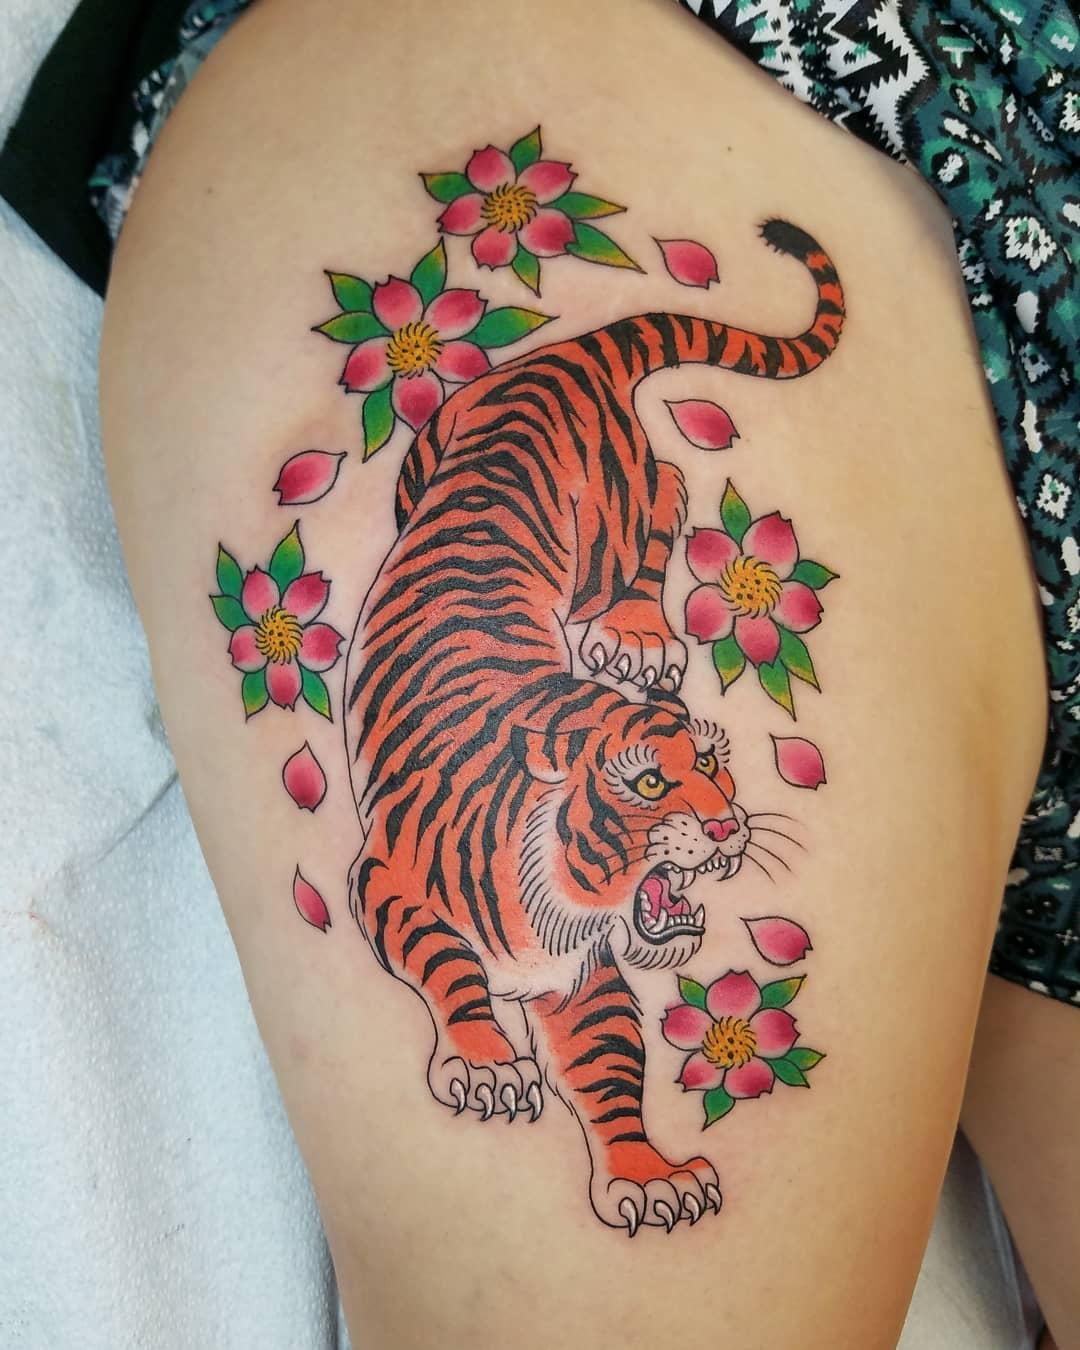 Inspiring Japanese Tiger Tattoo Designs